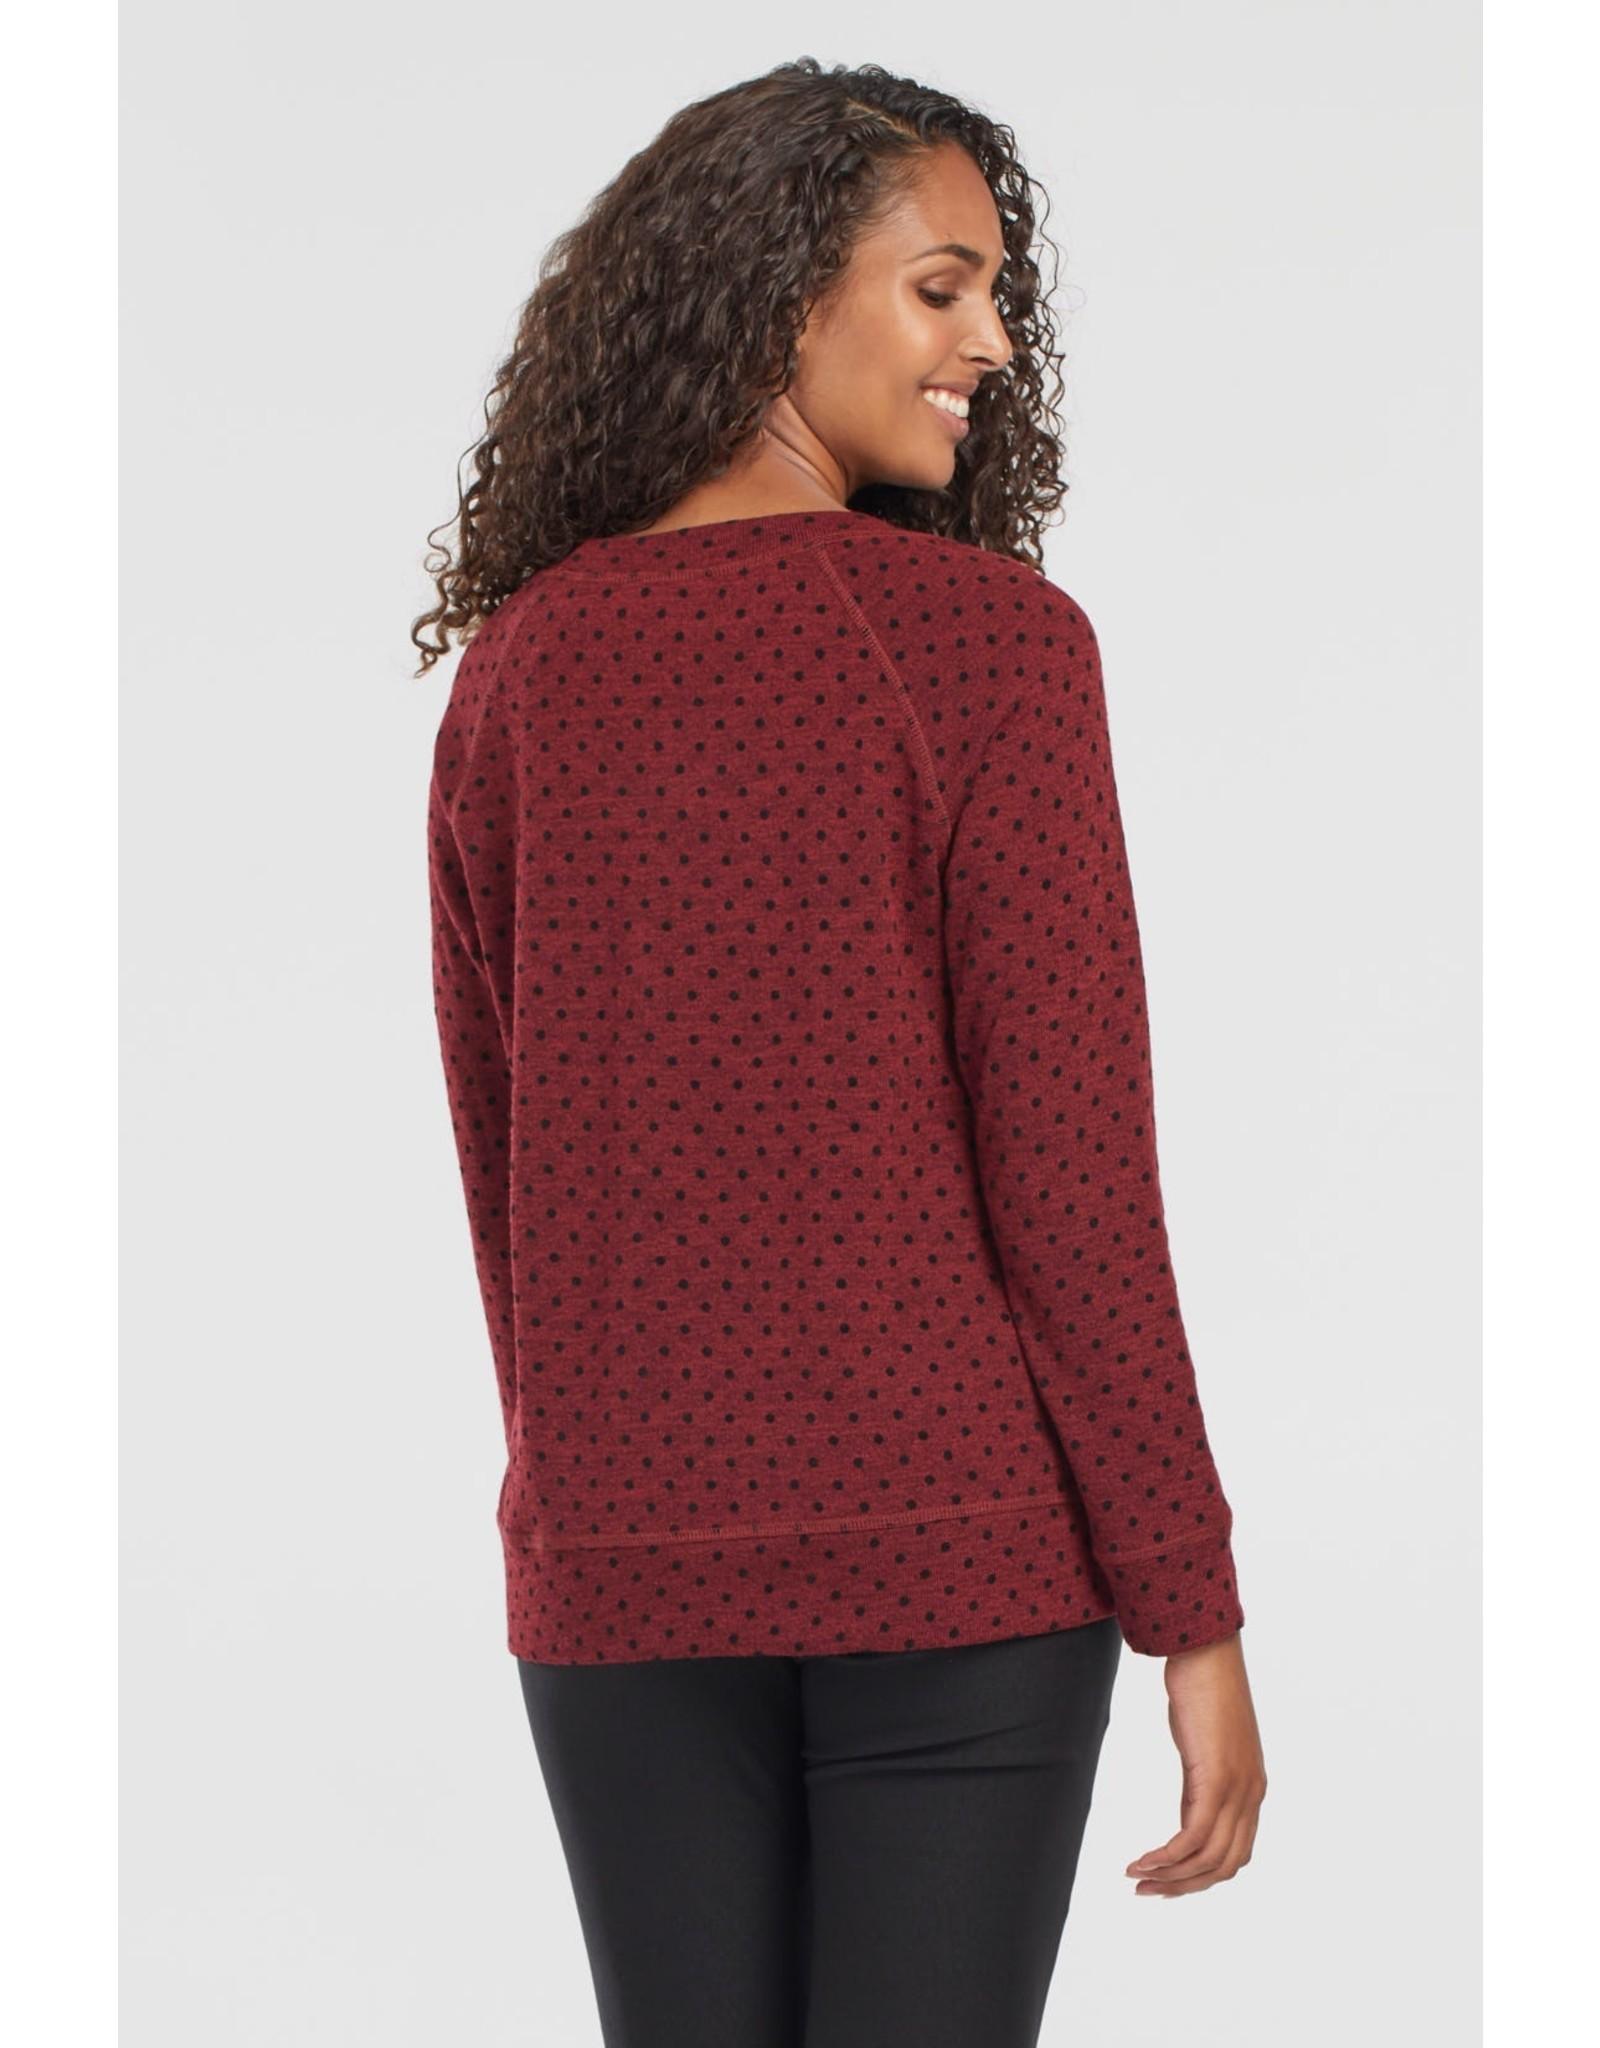 Tribal Polka Dot Soft Sweater 43100